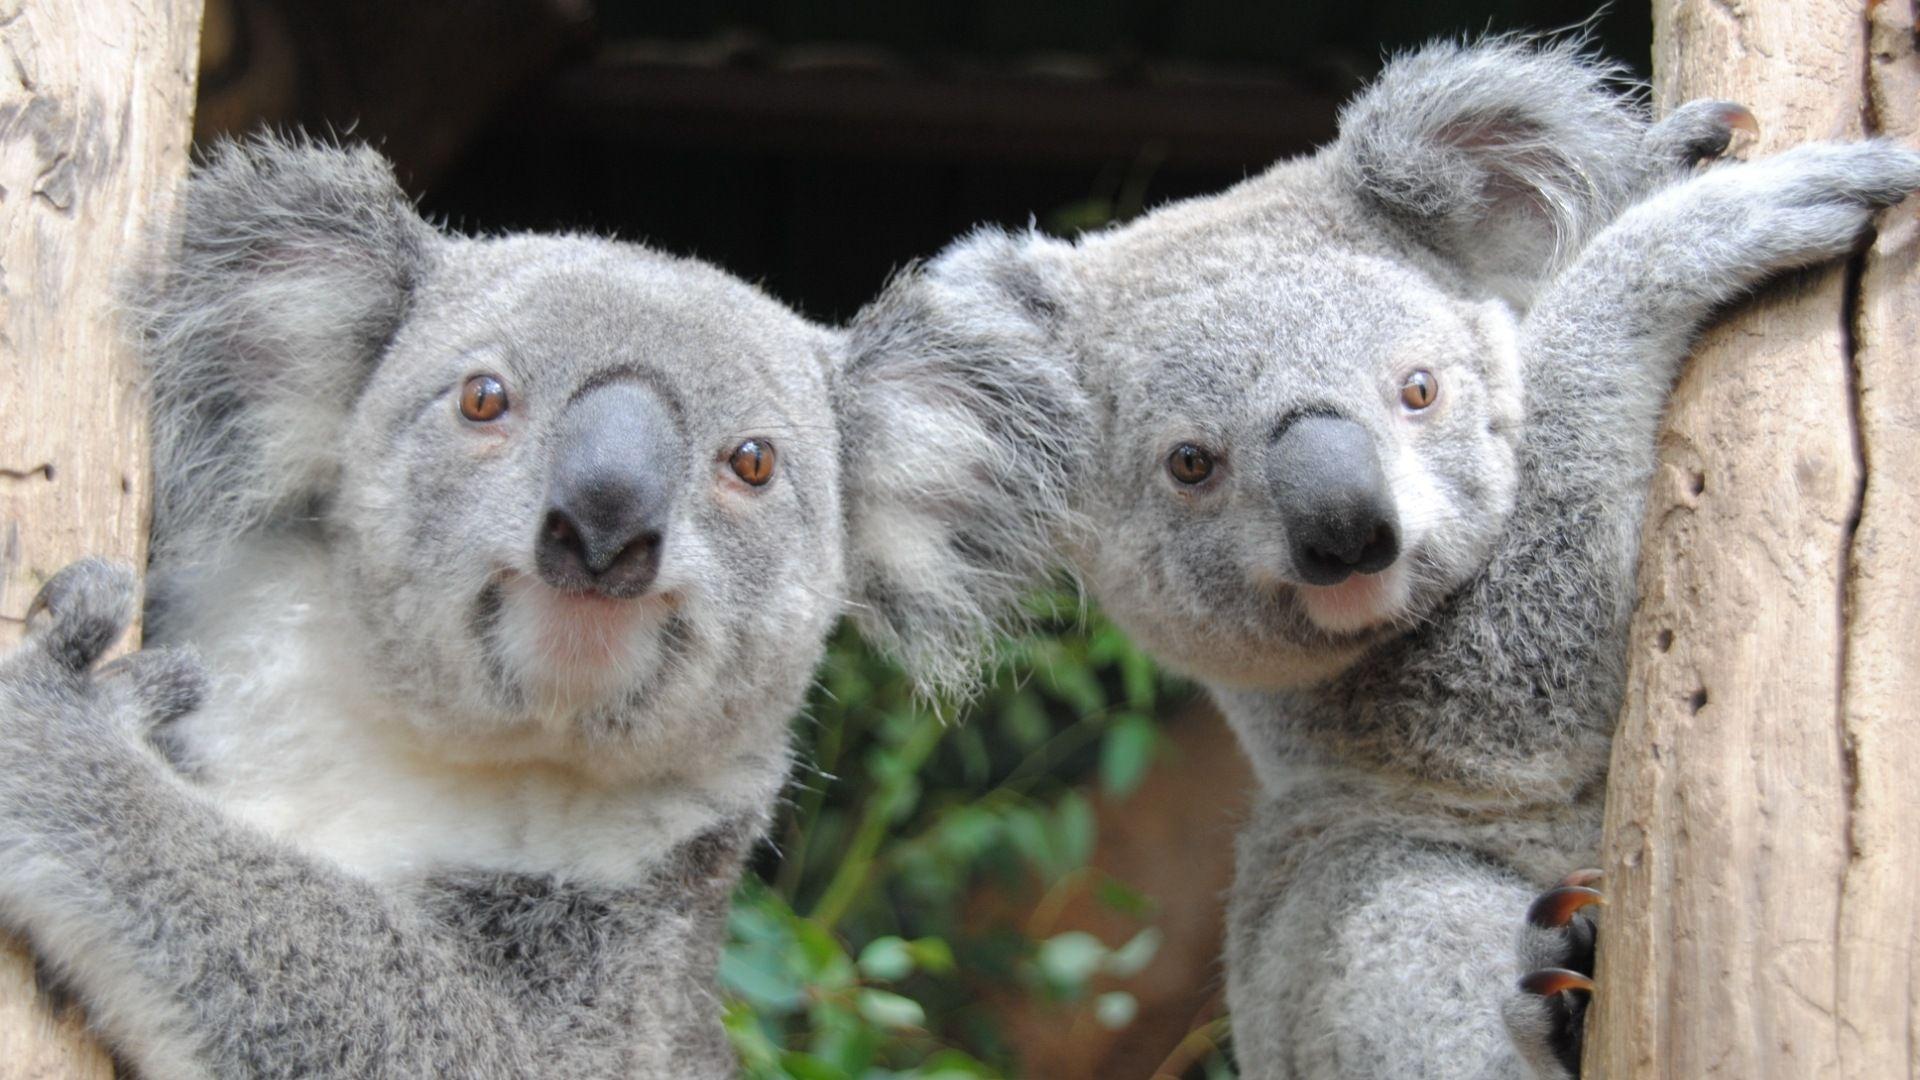 Koala Australia Photo